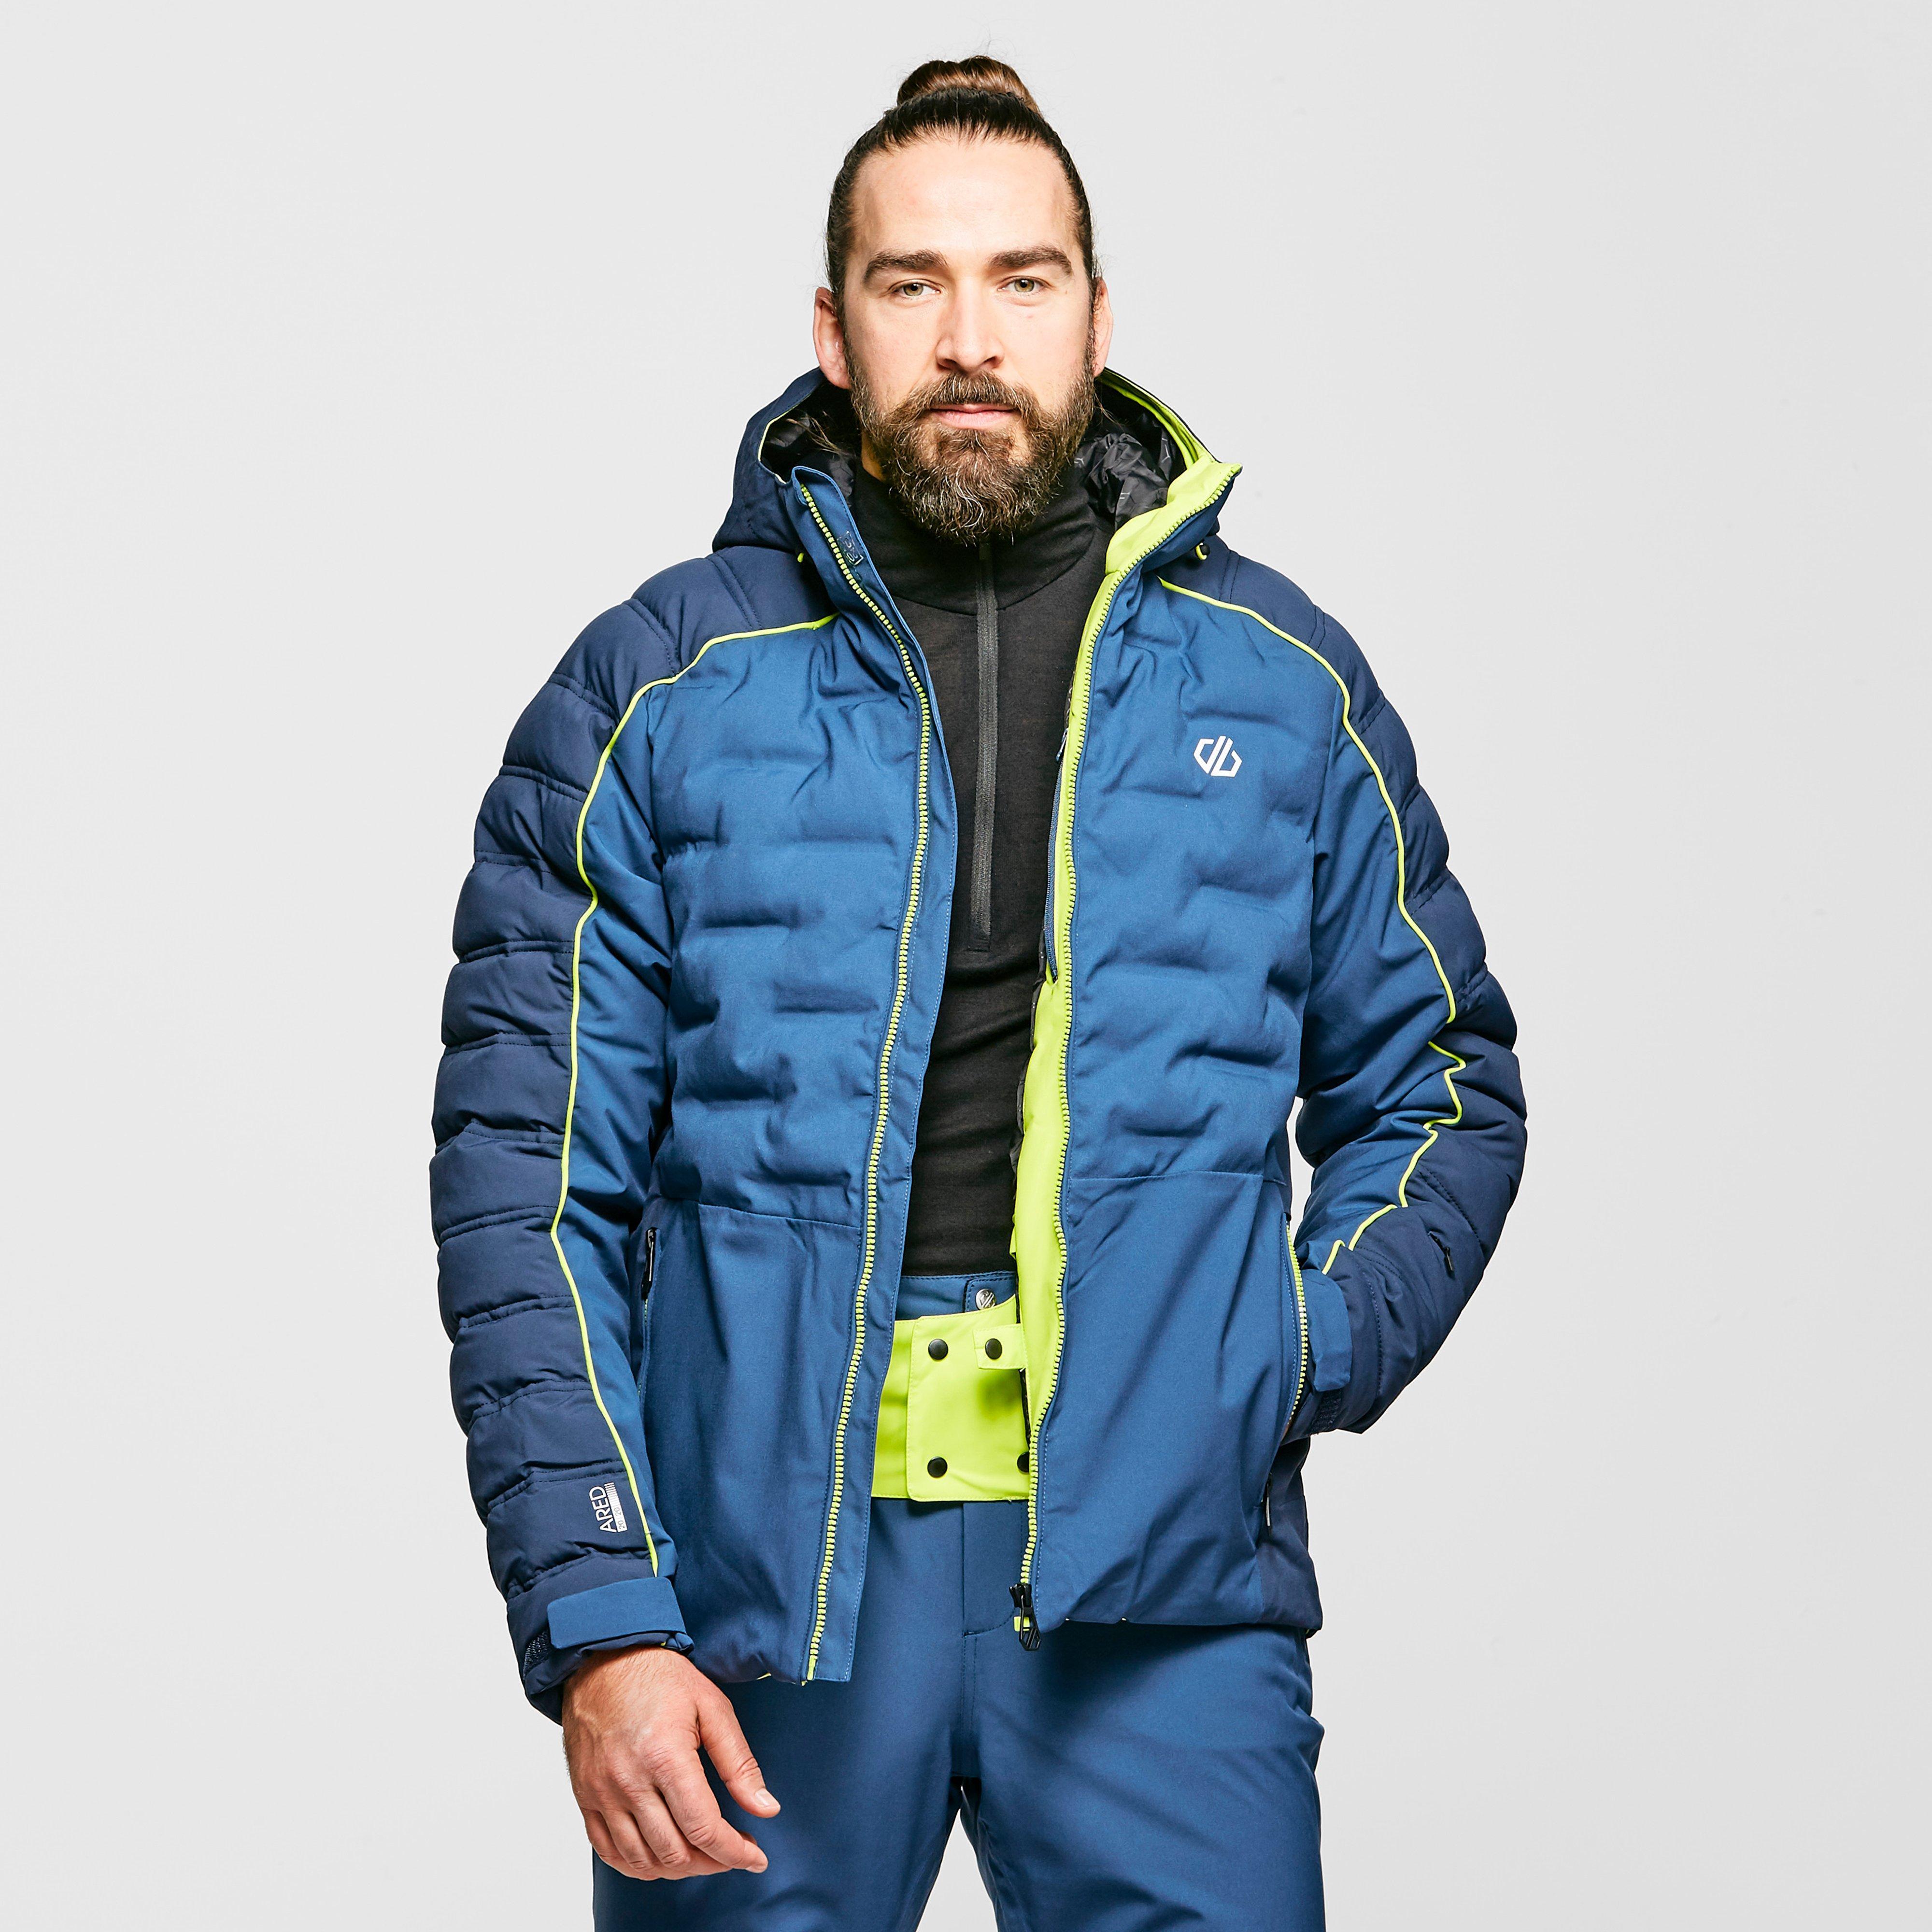 Dare 2B Men's Expounder Waterproof Insulated Ski Jacket - Blue/Blue, Blue